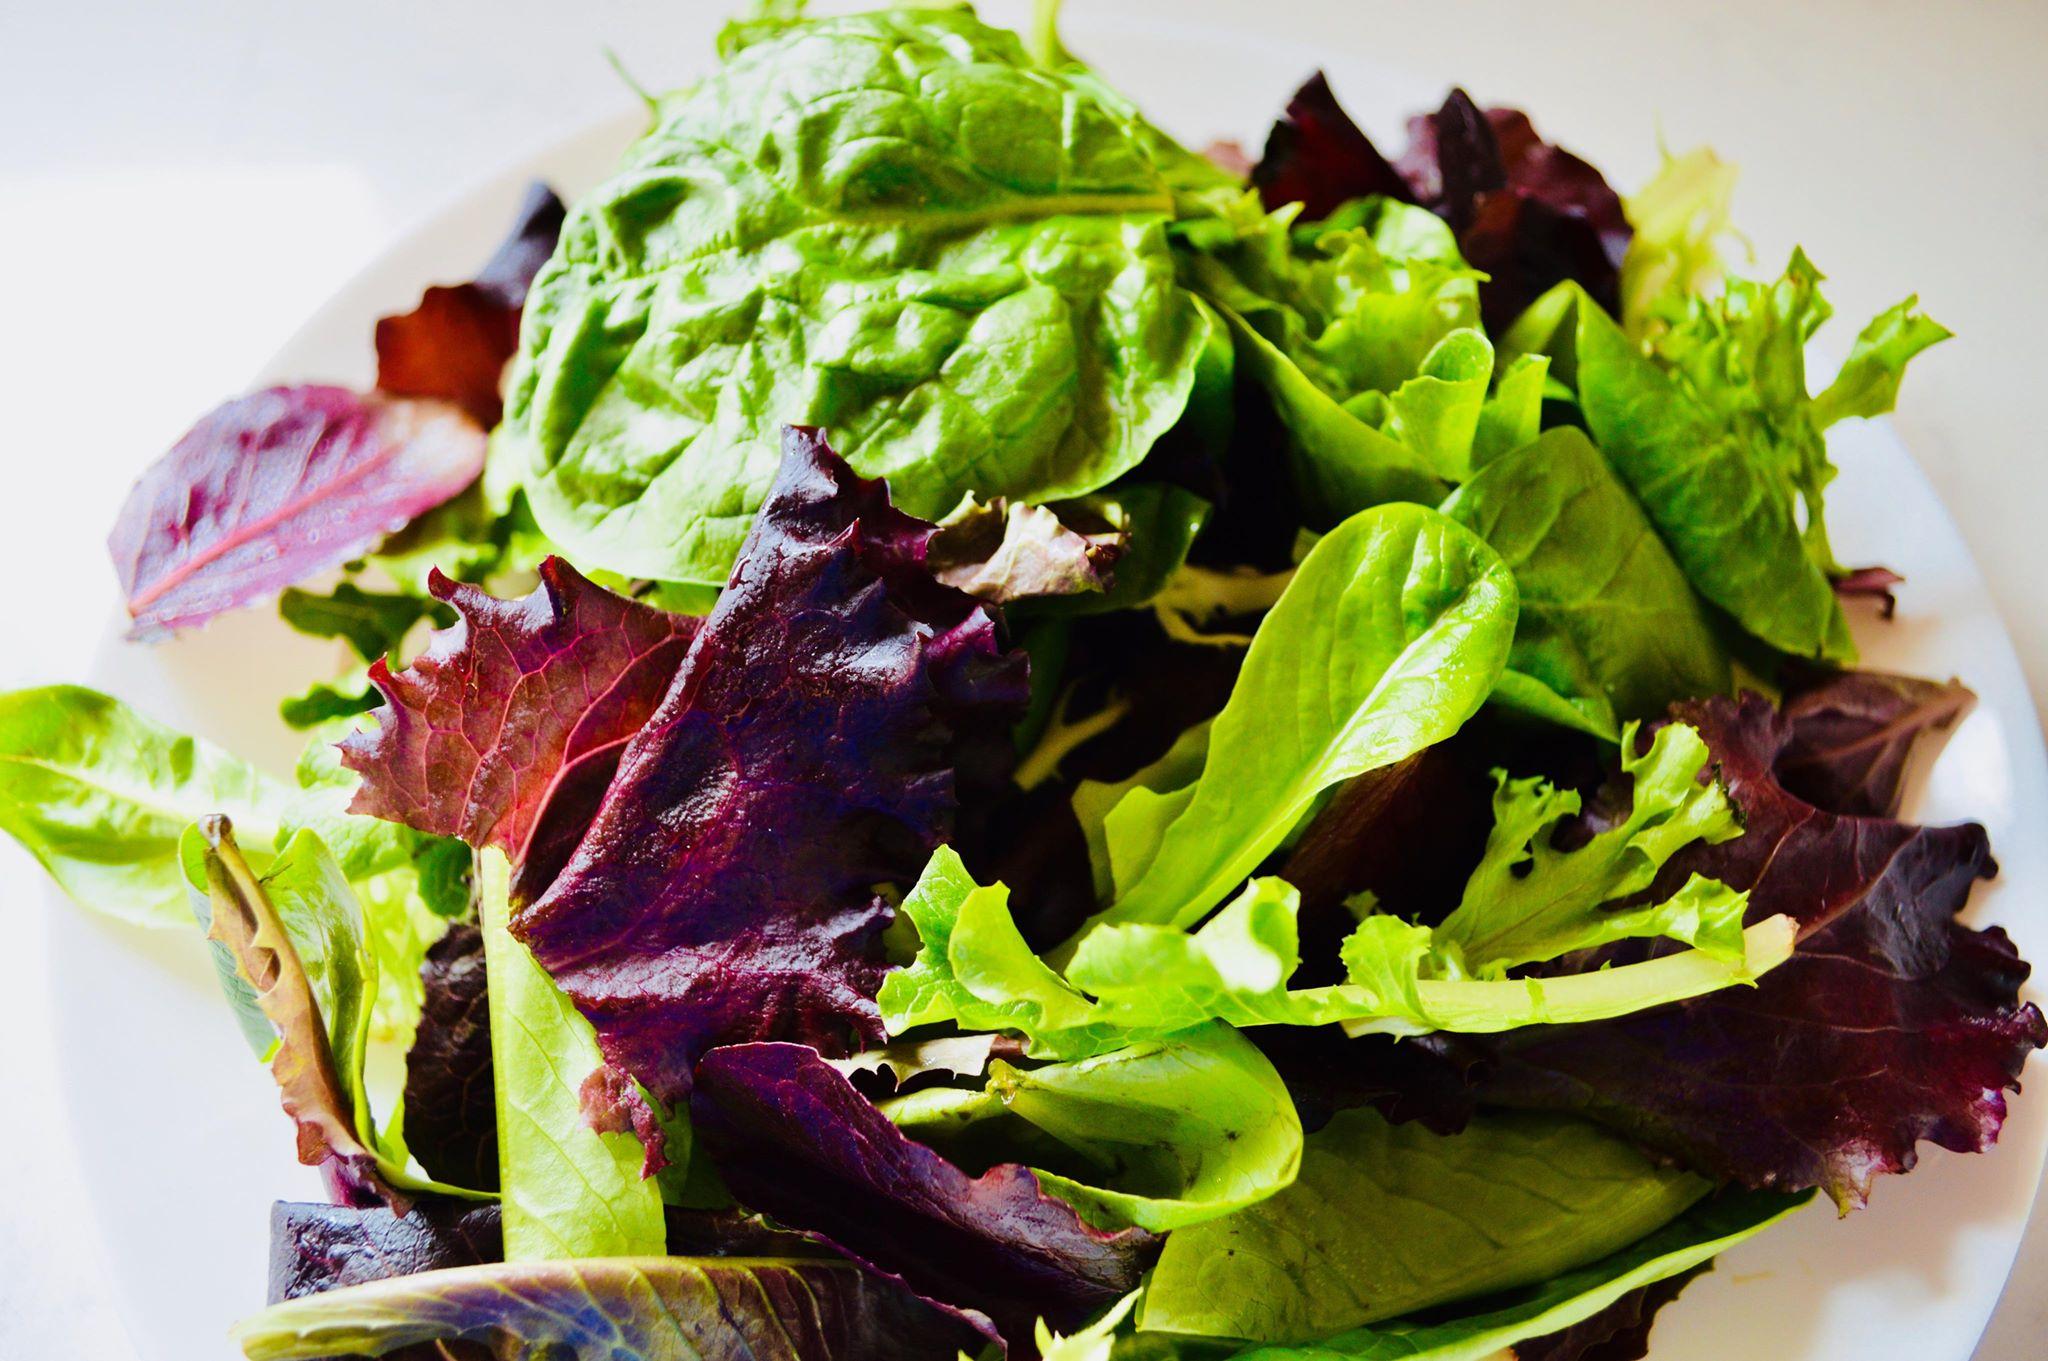 greens, spinach, microgreens, organic,backyard garden, microfarm, homestead, modern homestead, homesteading,